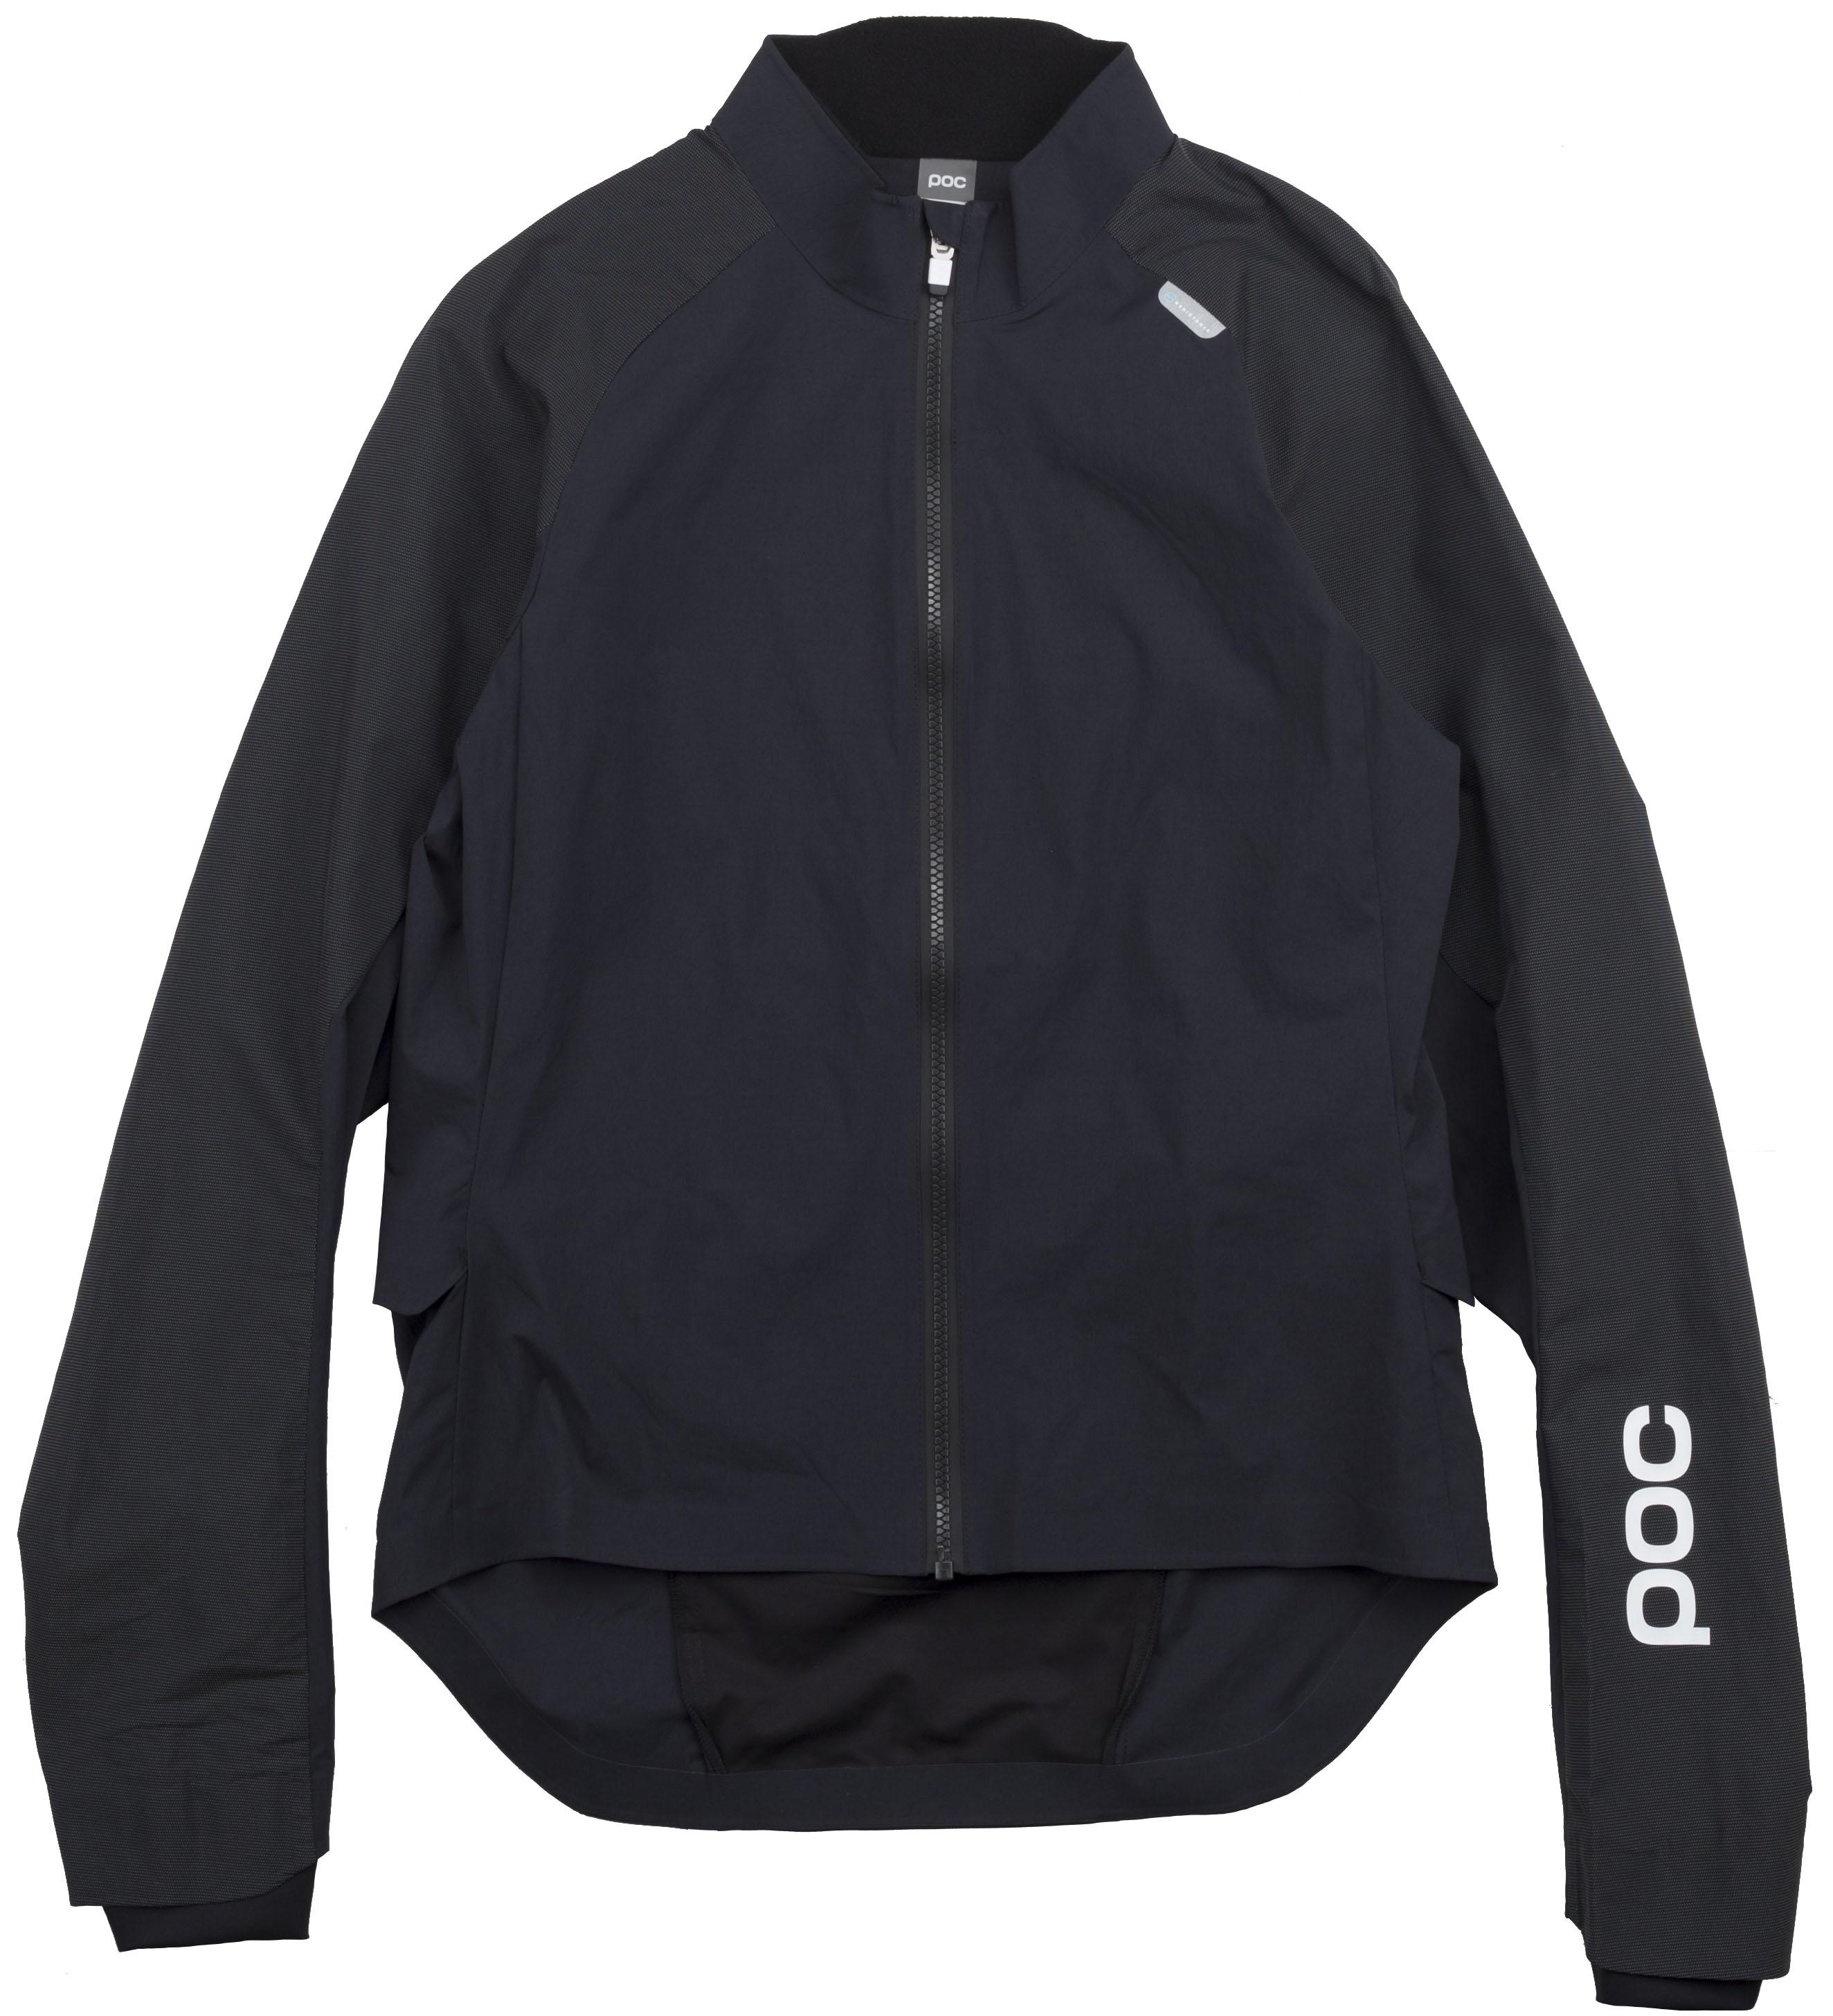 POC Resistance Pro XC Splash Jacket